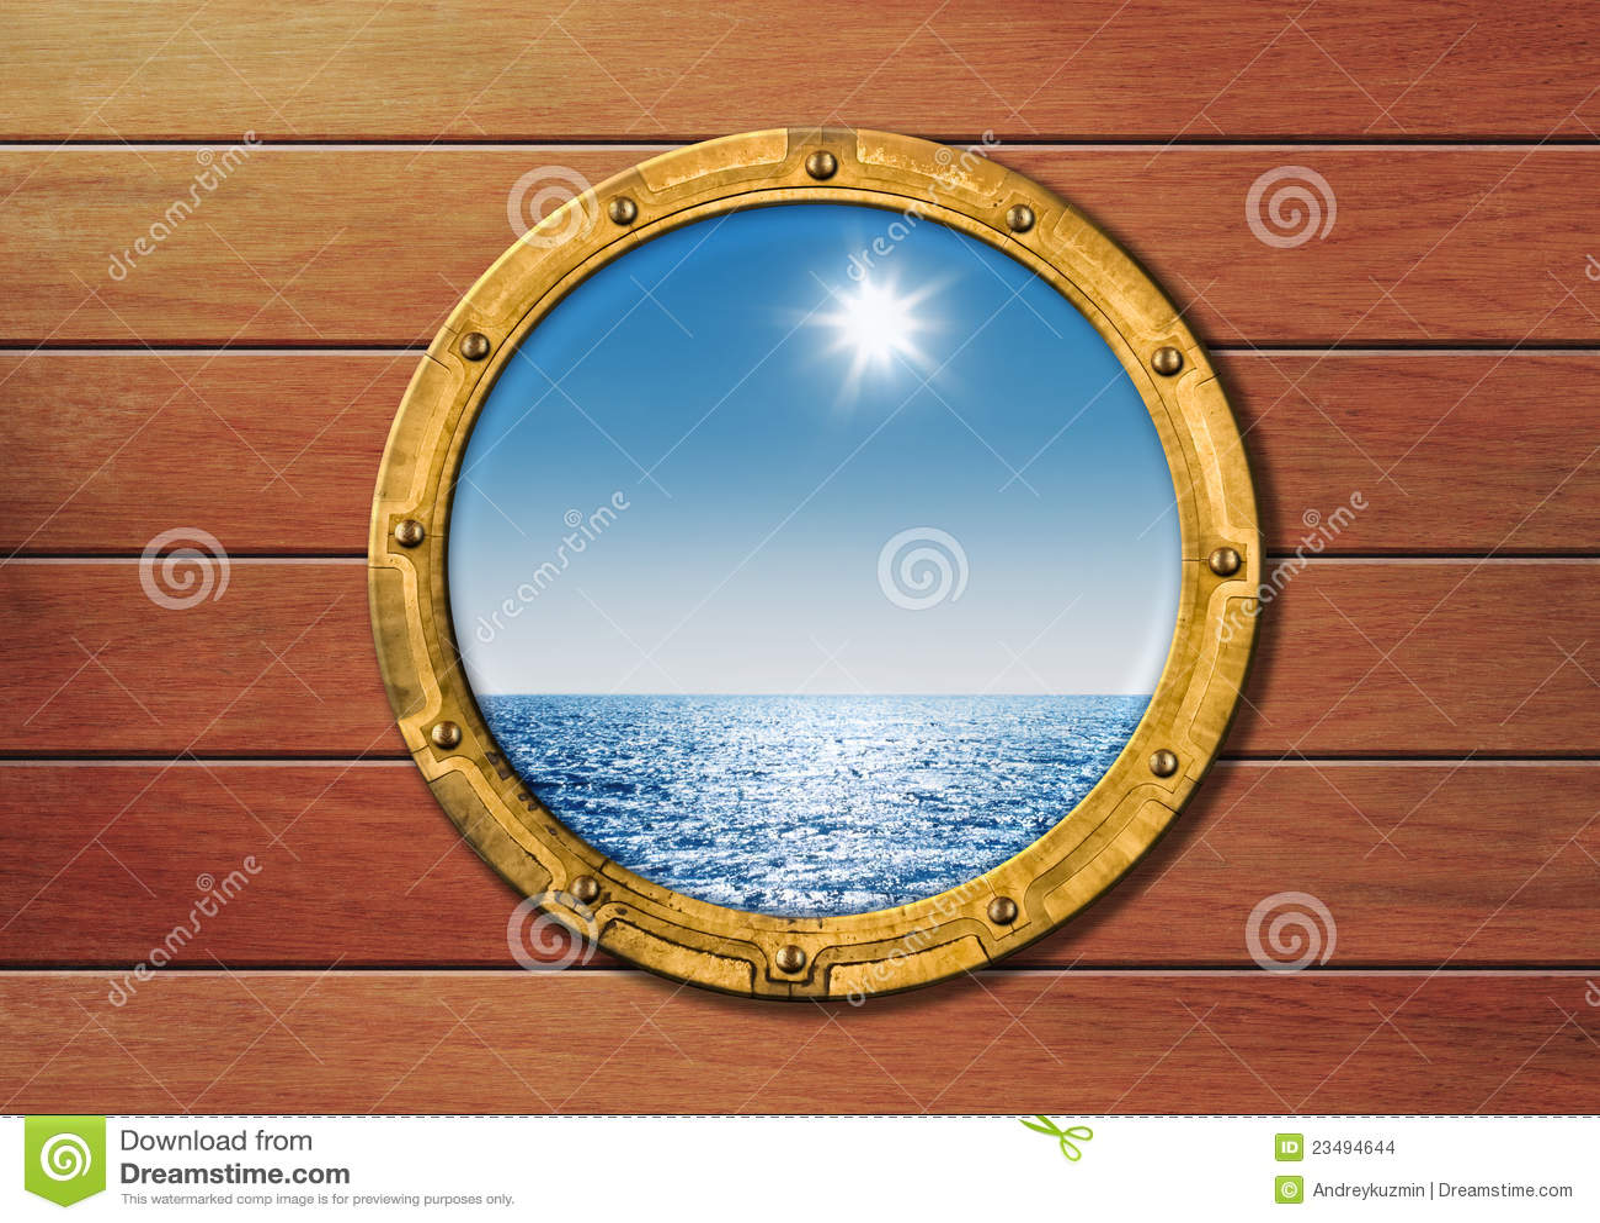 ship porthole on wooden wall stock images image 23494644. Black Bedroom Furniture Sets. Home Design Ideas